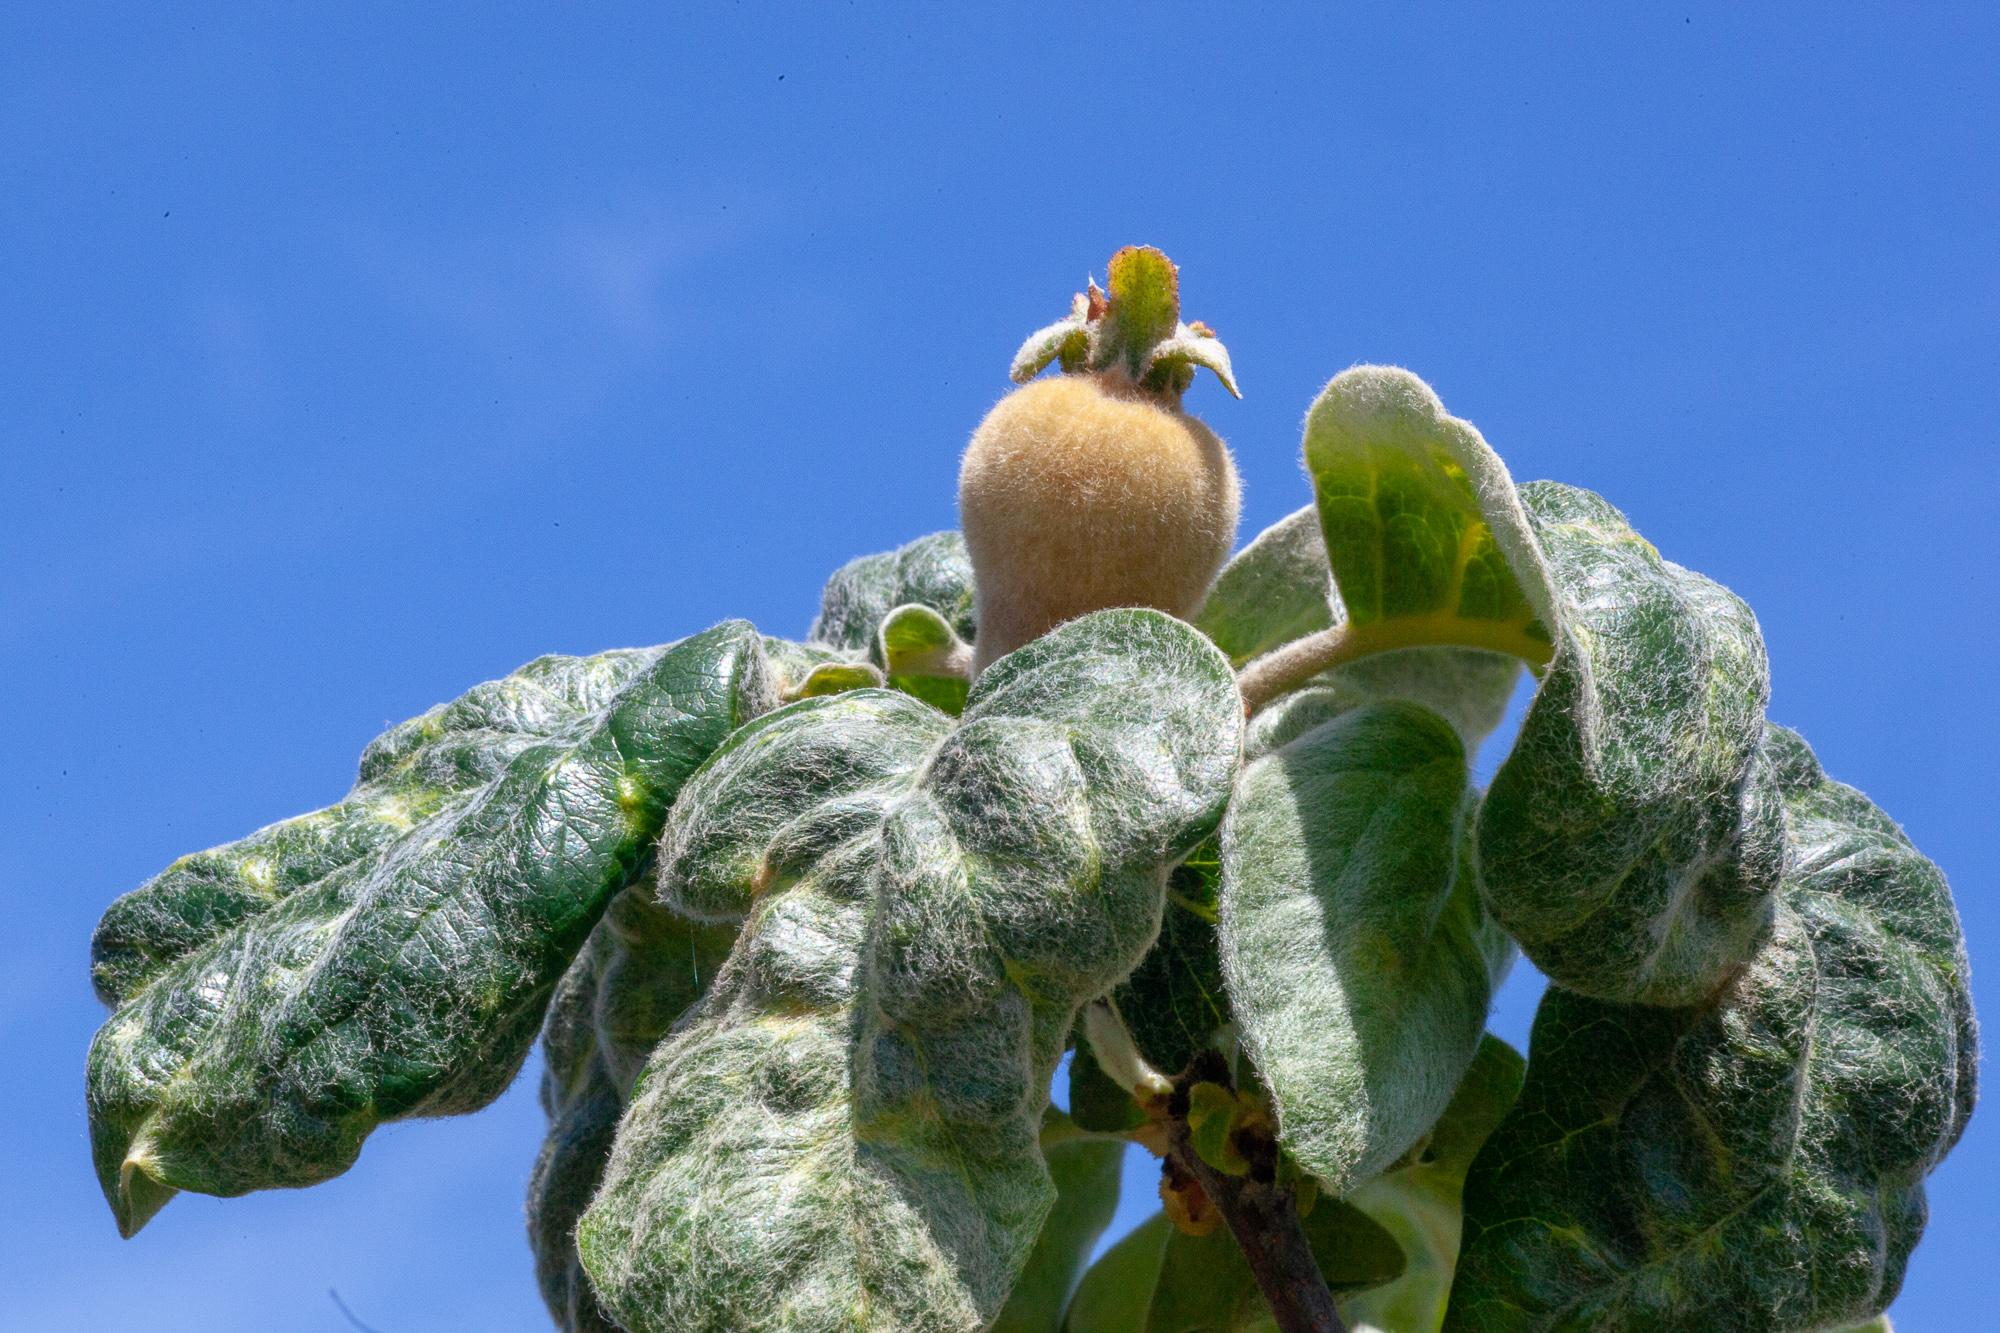 Fuzzy Aromatnaya quince, no thinning necessary